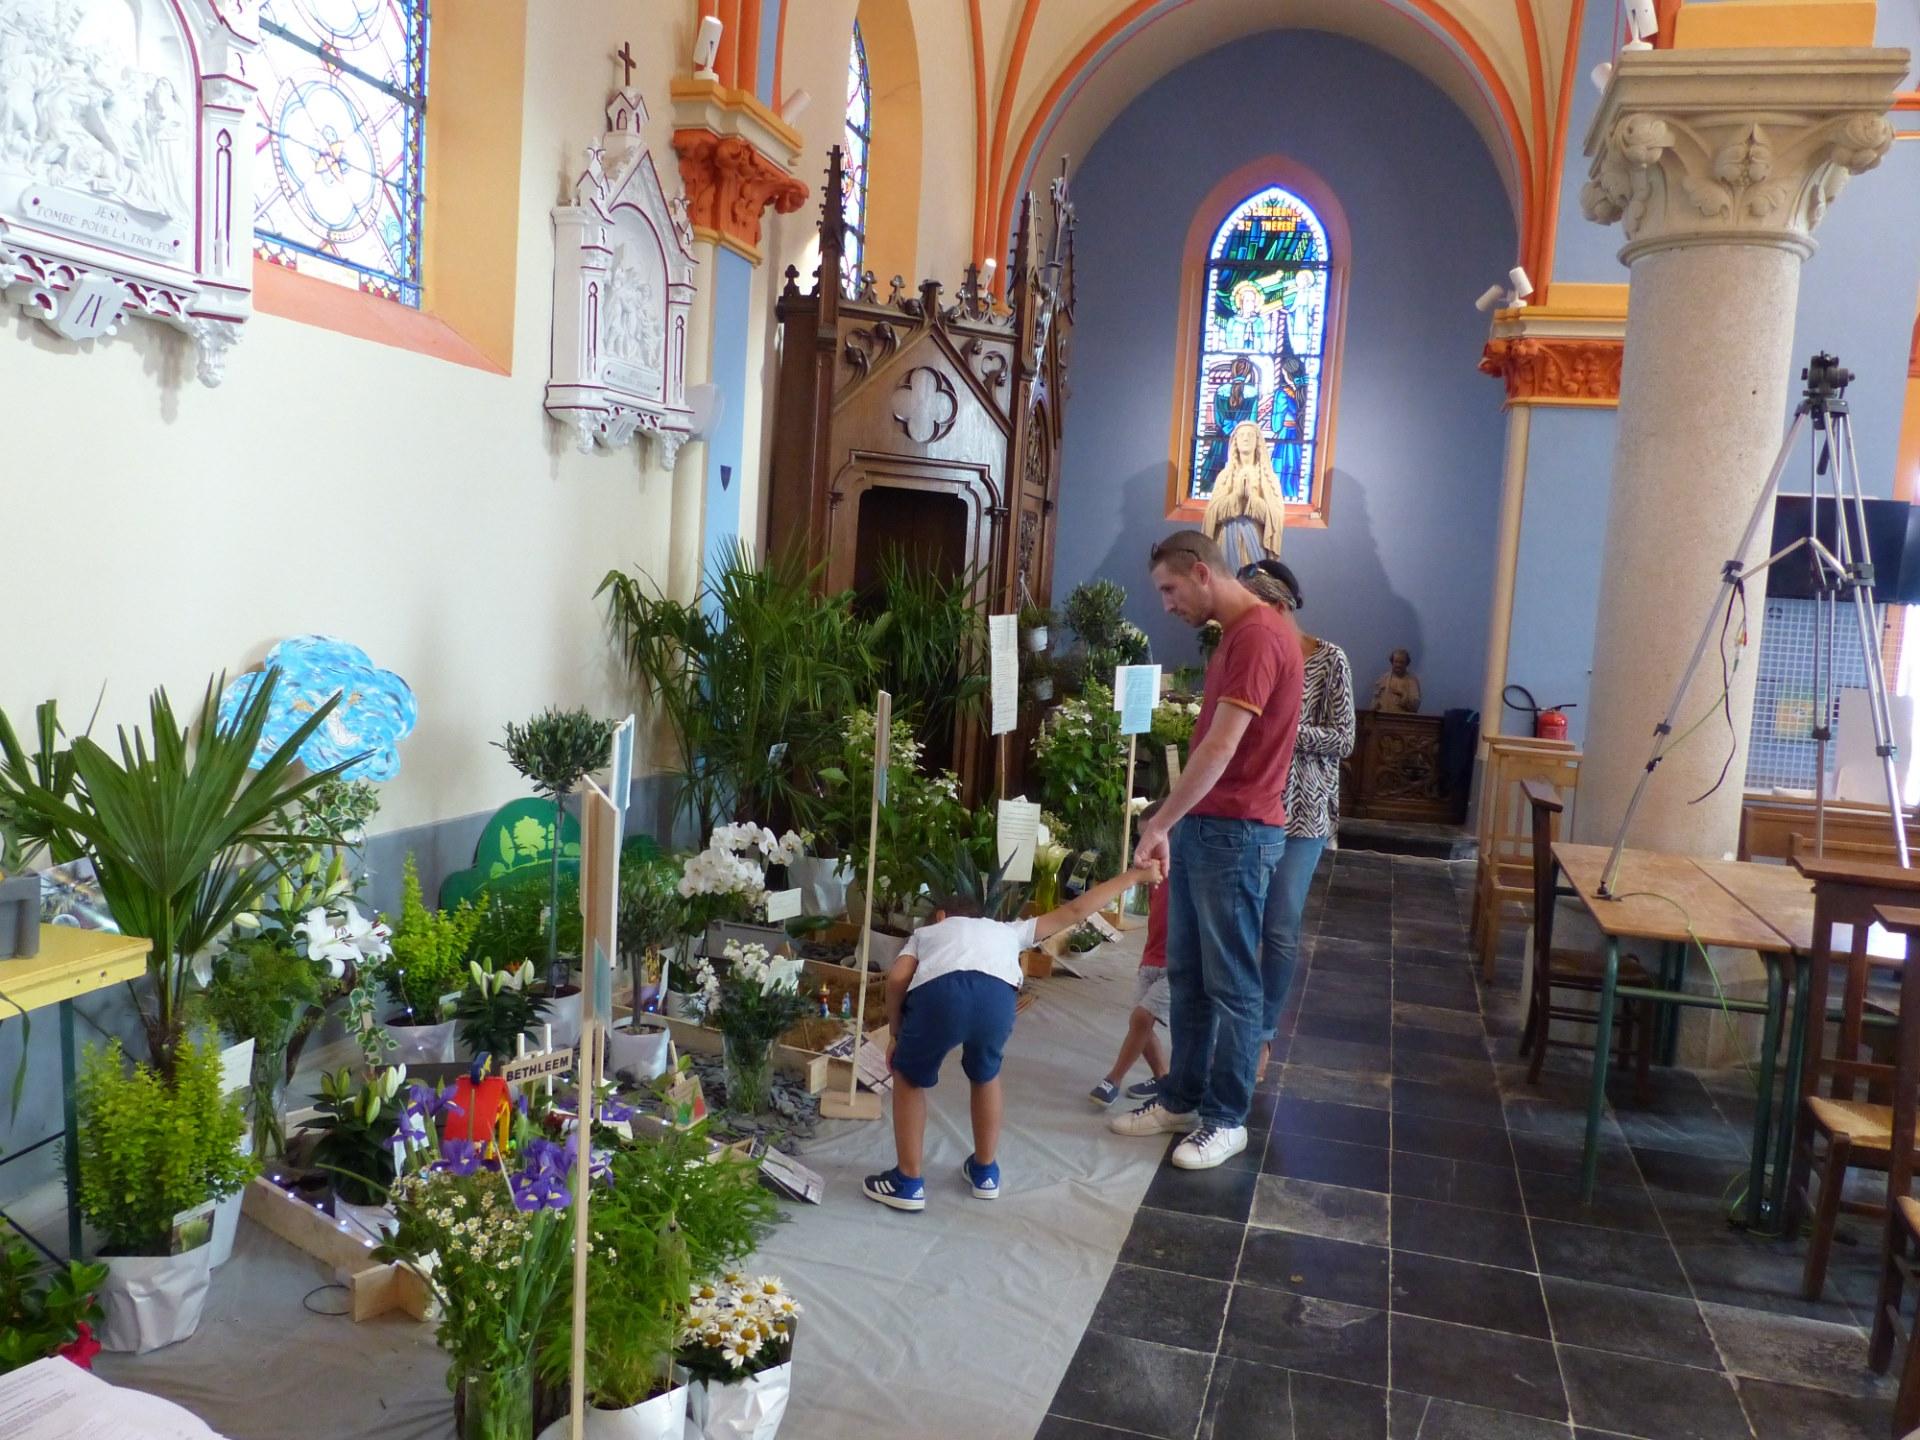 St Fiacre 9